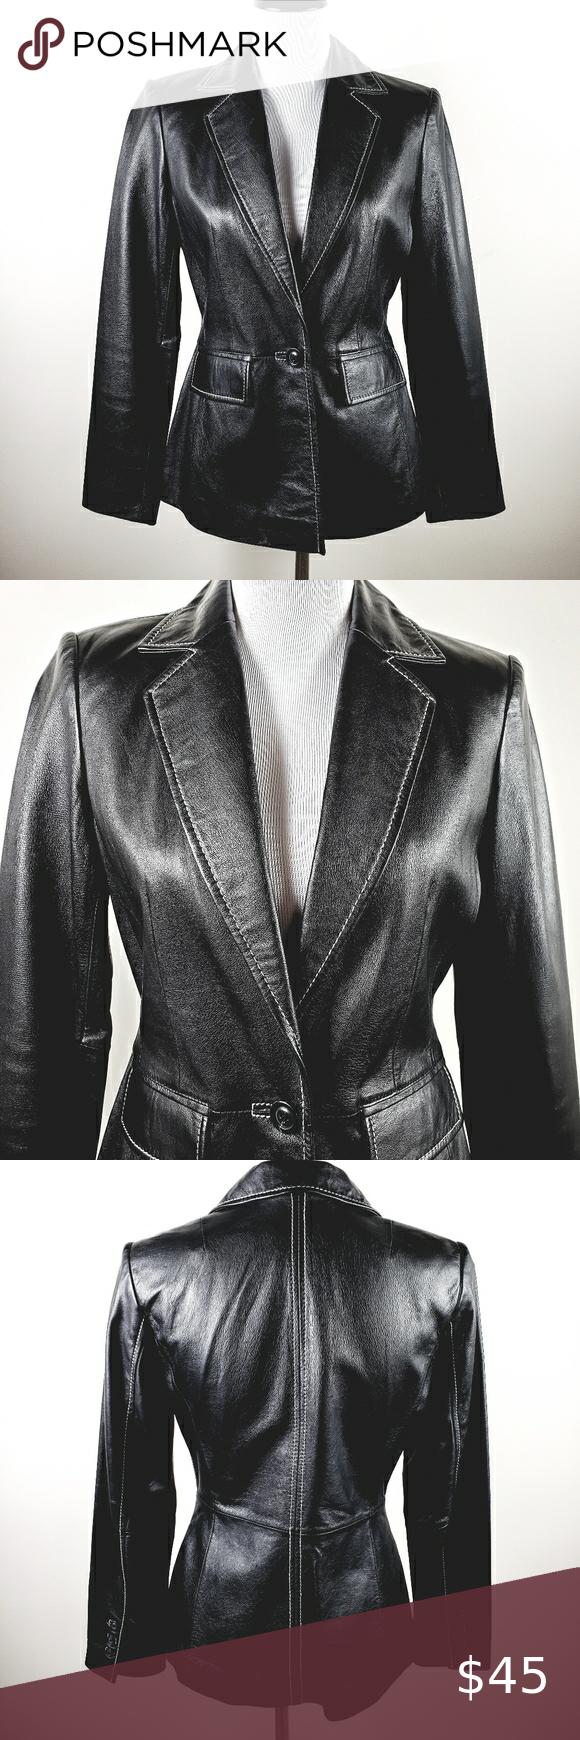 Inc International Concepts Leather Jacket Leather Jacket Clothes Design Jackets [ 1740 x 580 Pixel ]